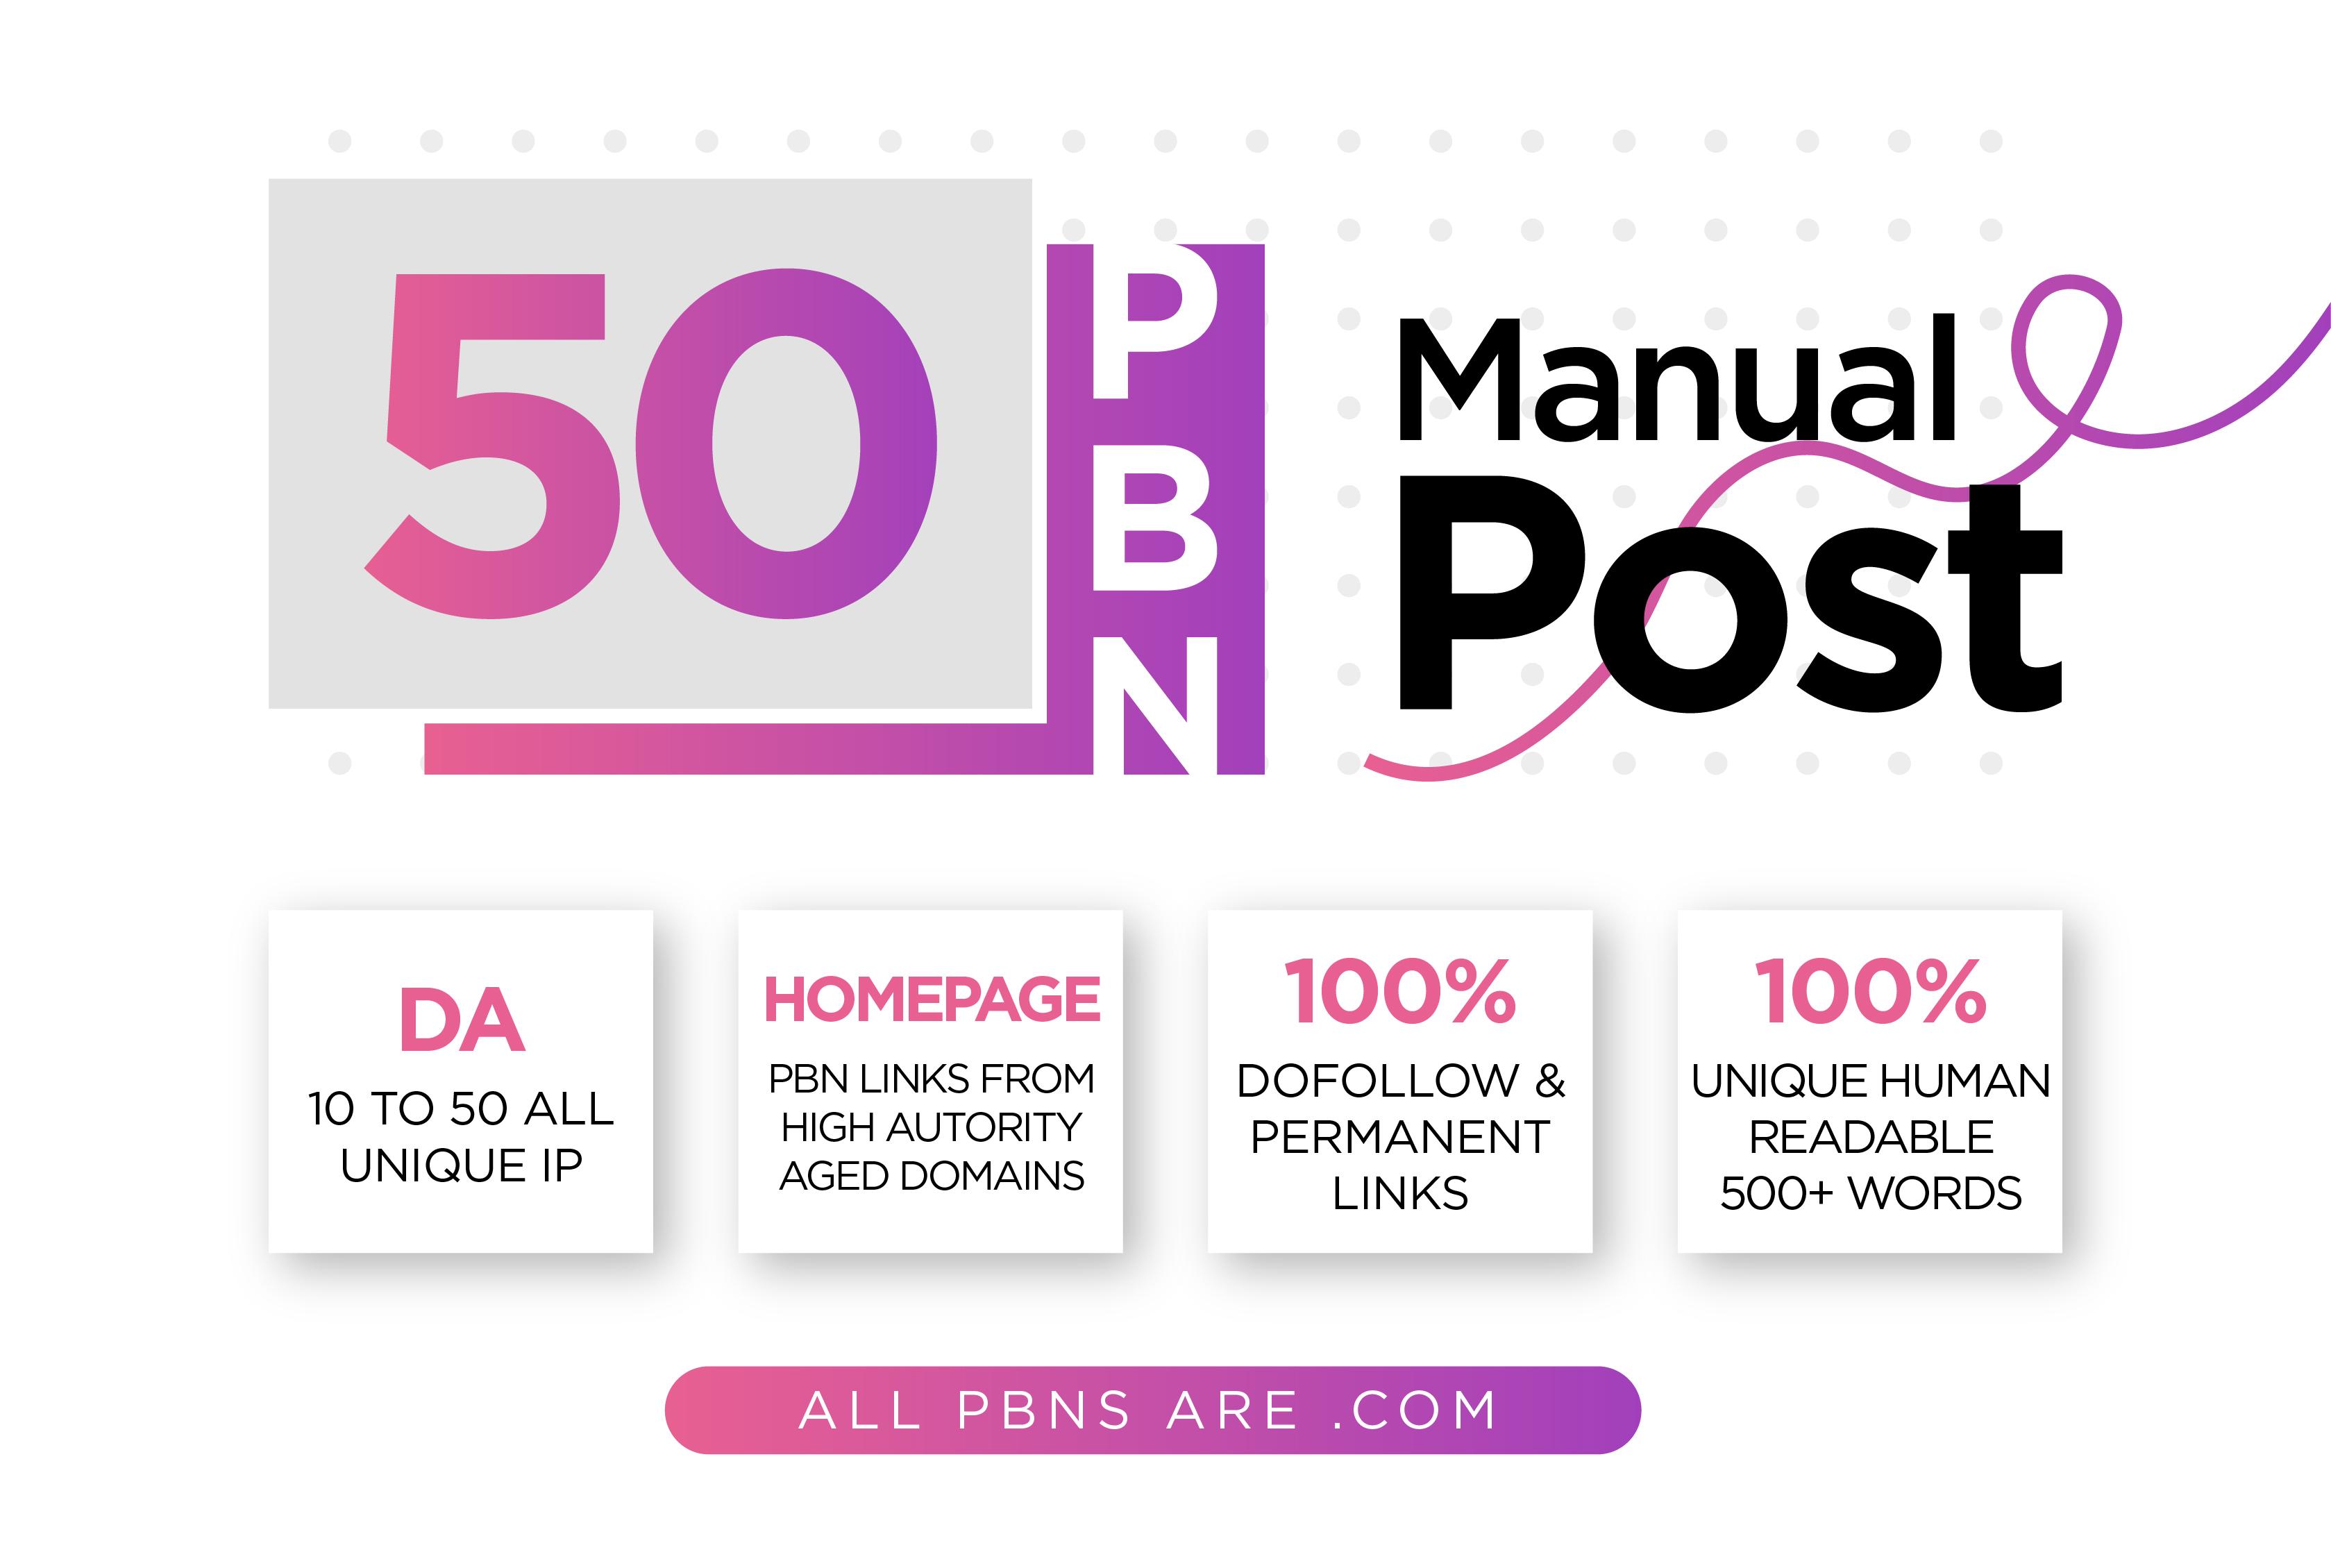 Build 50 permanent homepage pbn backlink in google ranking